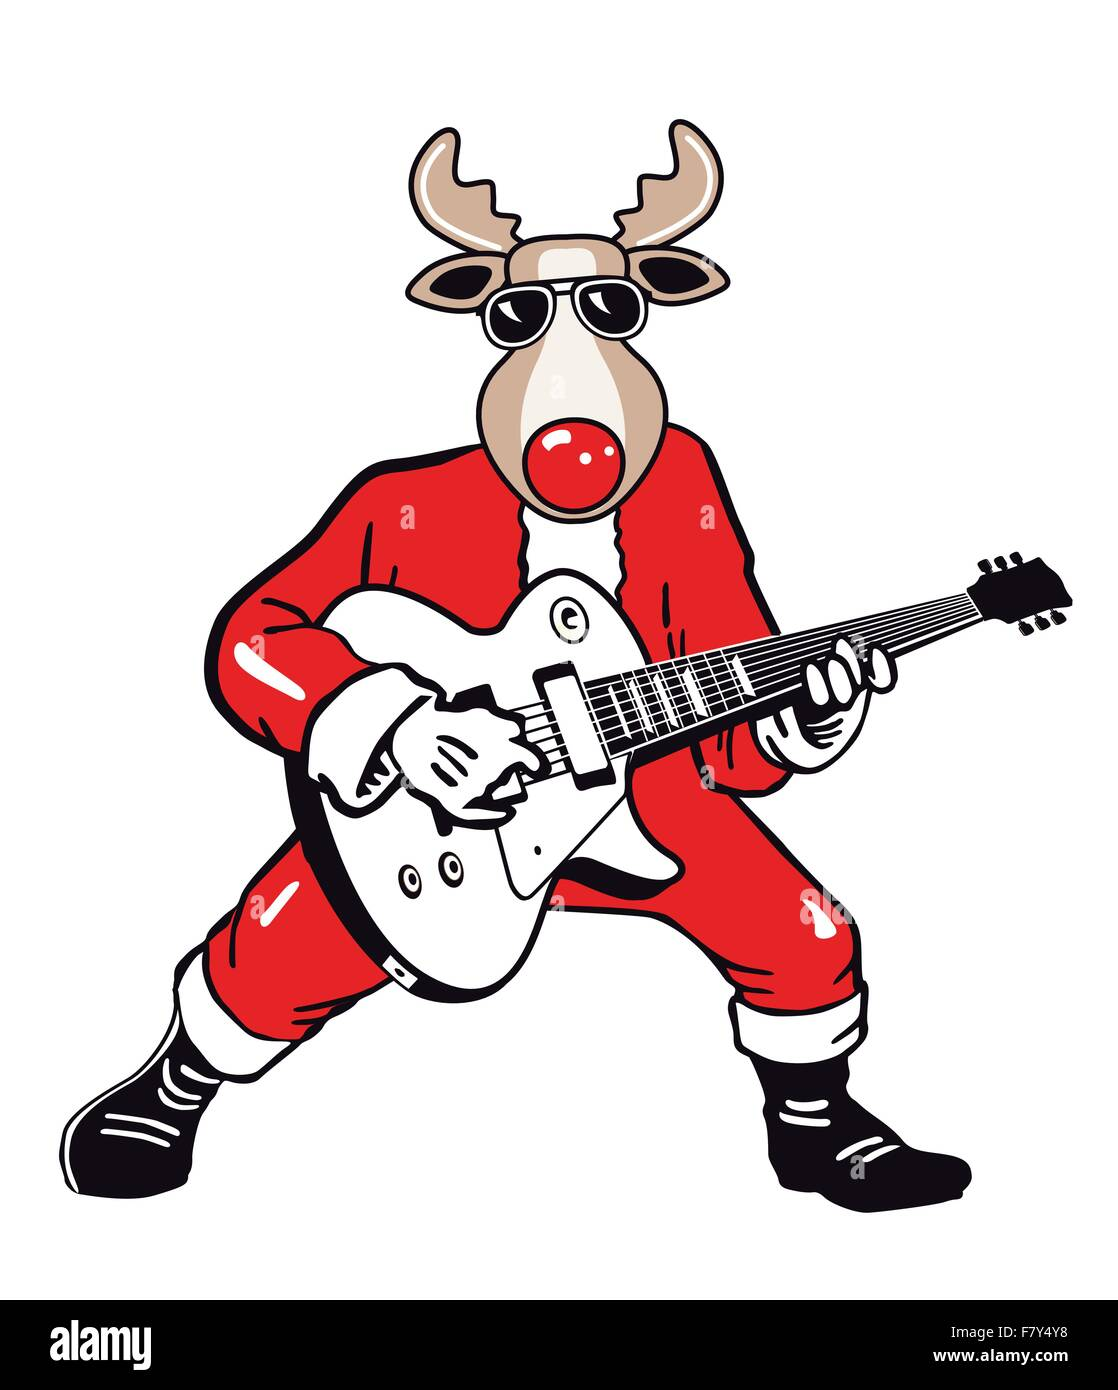 Christmas Reindeer Rocker - Stock Image